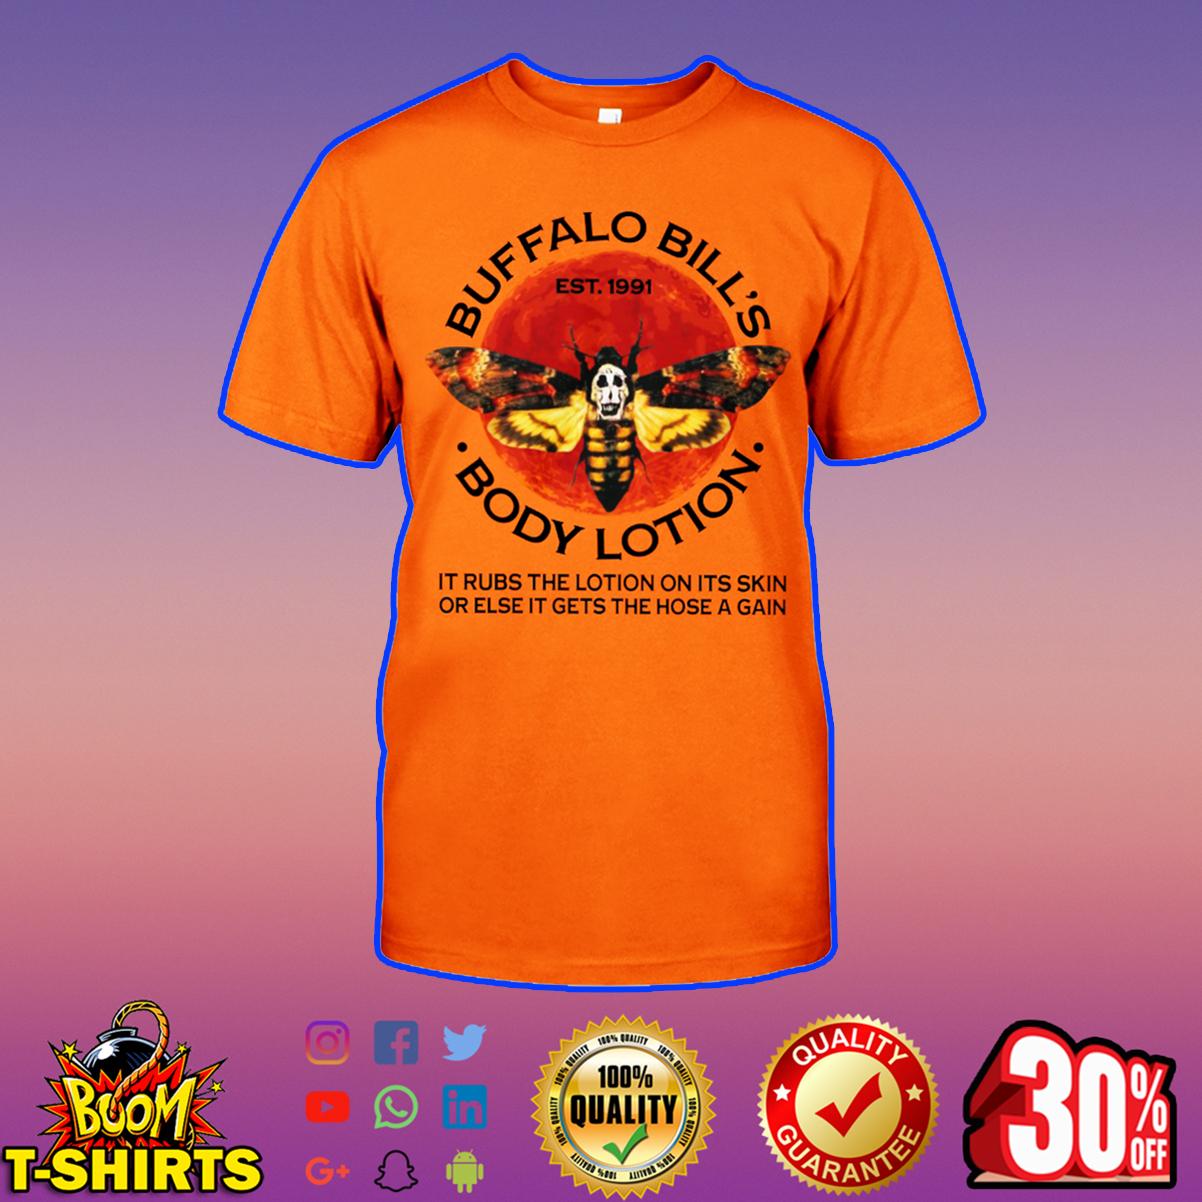 Buffalo bill's body lotion shirt